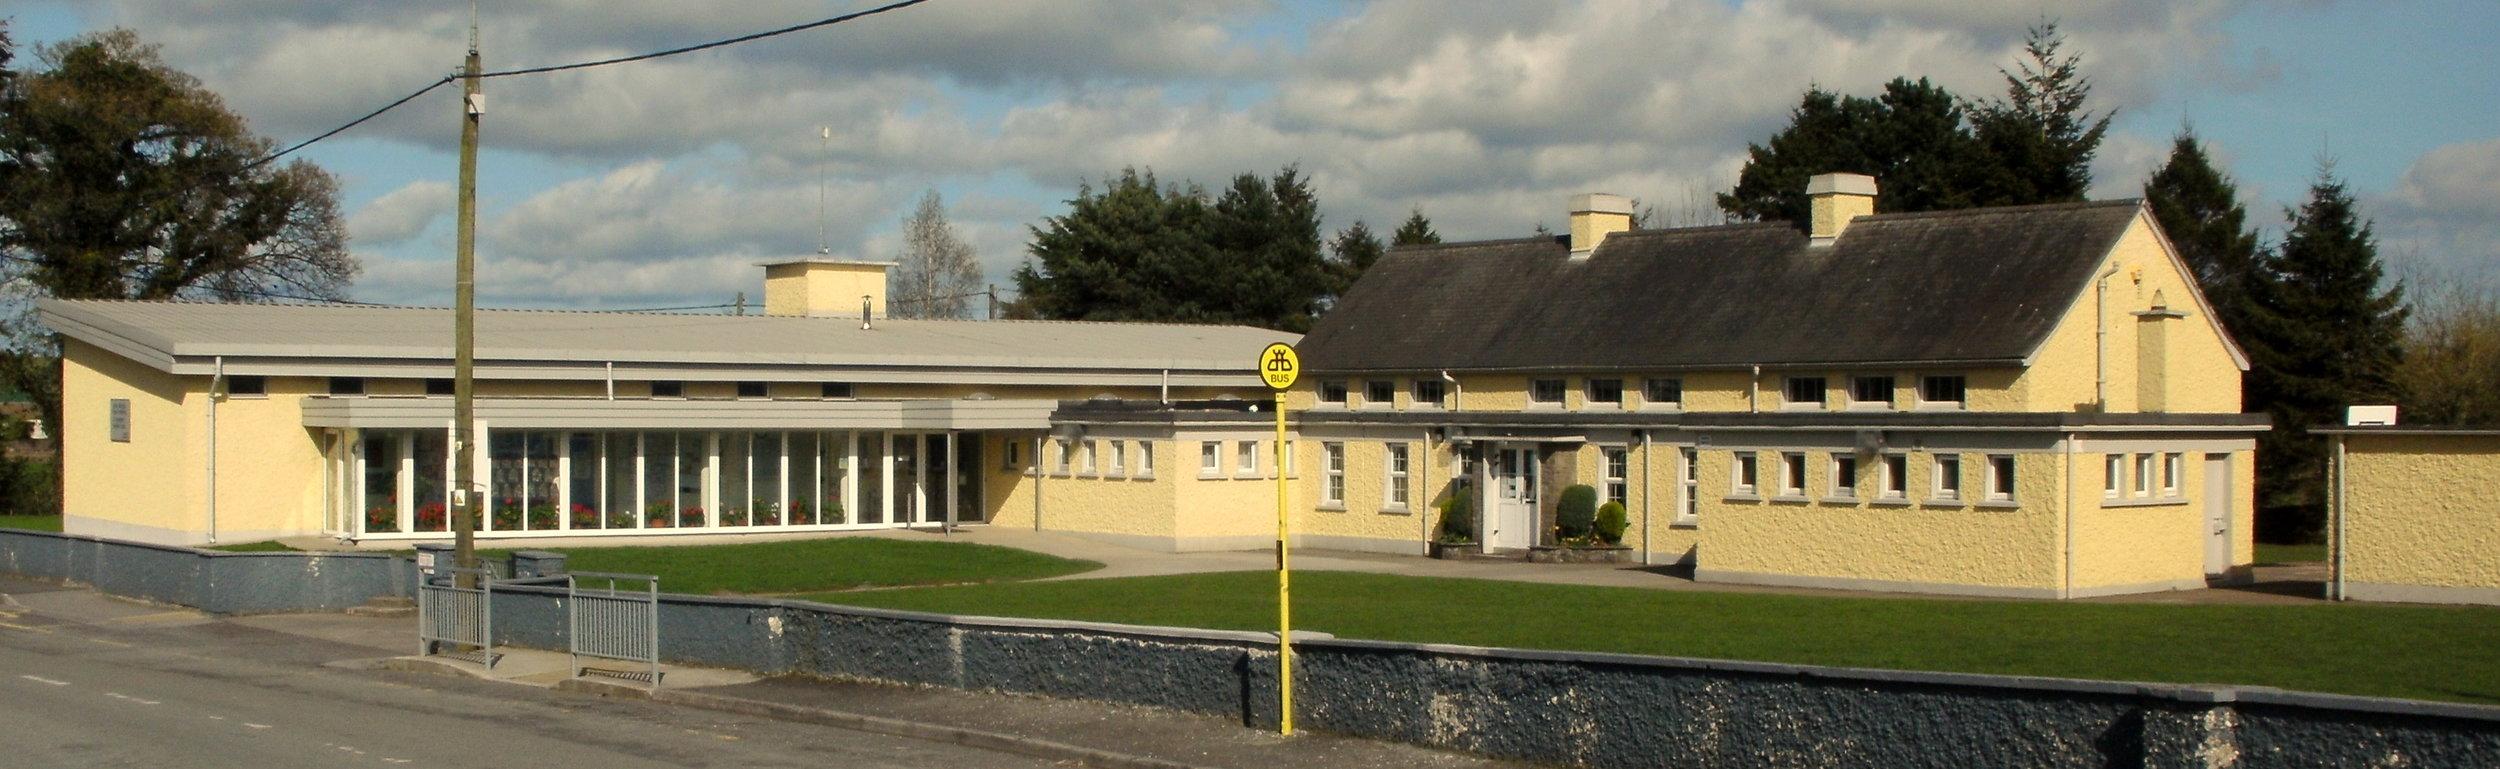 ST. MARGARETS NATIONAL SCHOOL -